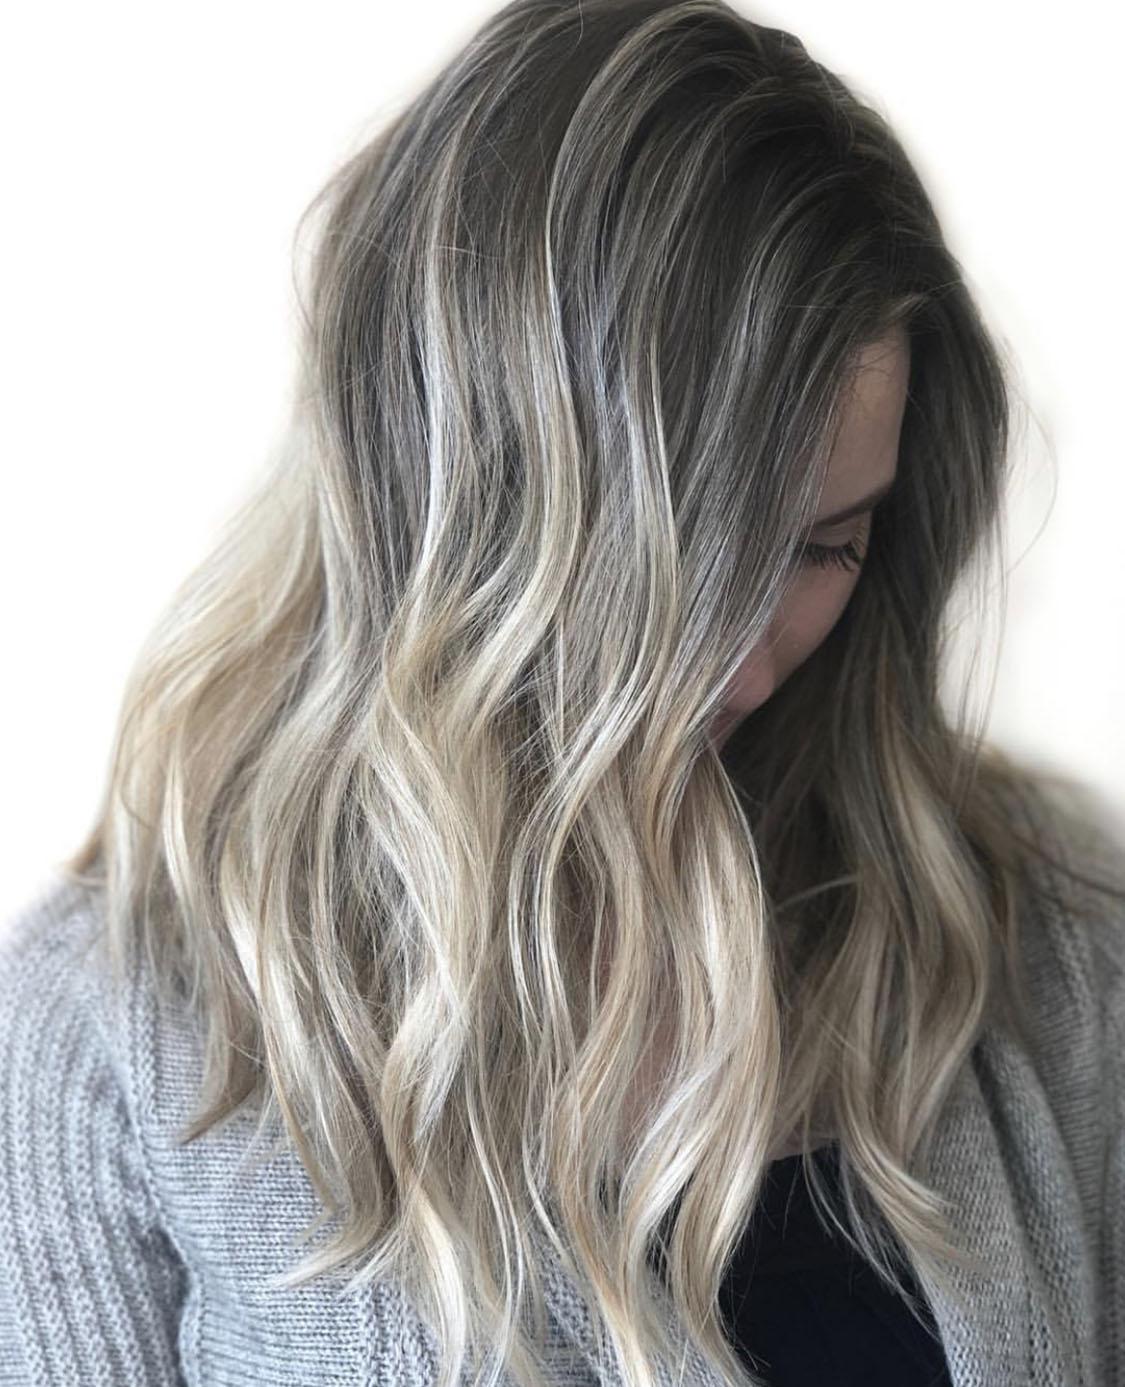 Lived-in Blonding (Balayage/Foilayage)